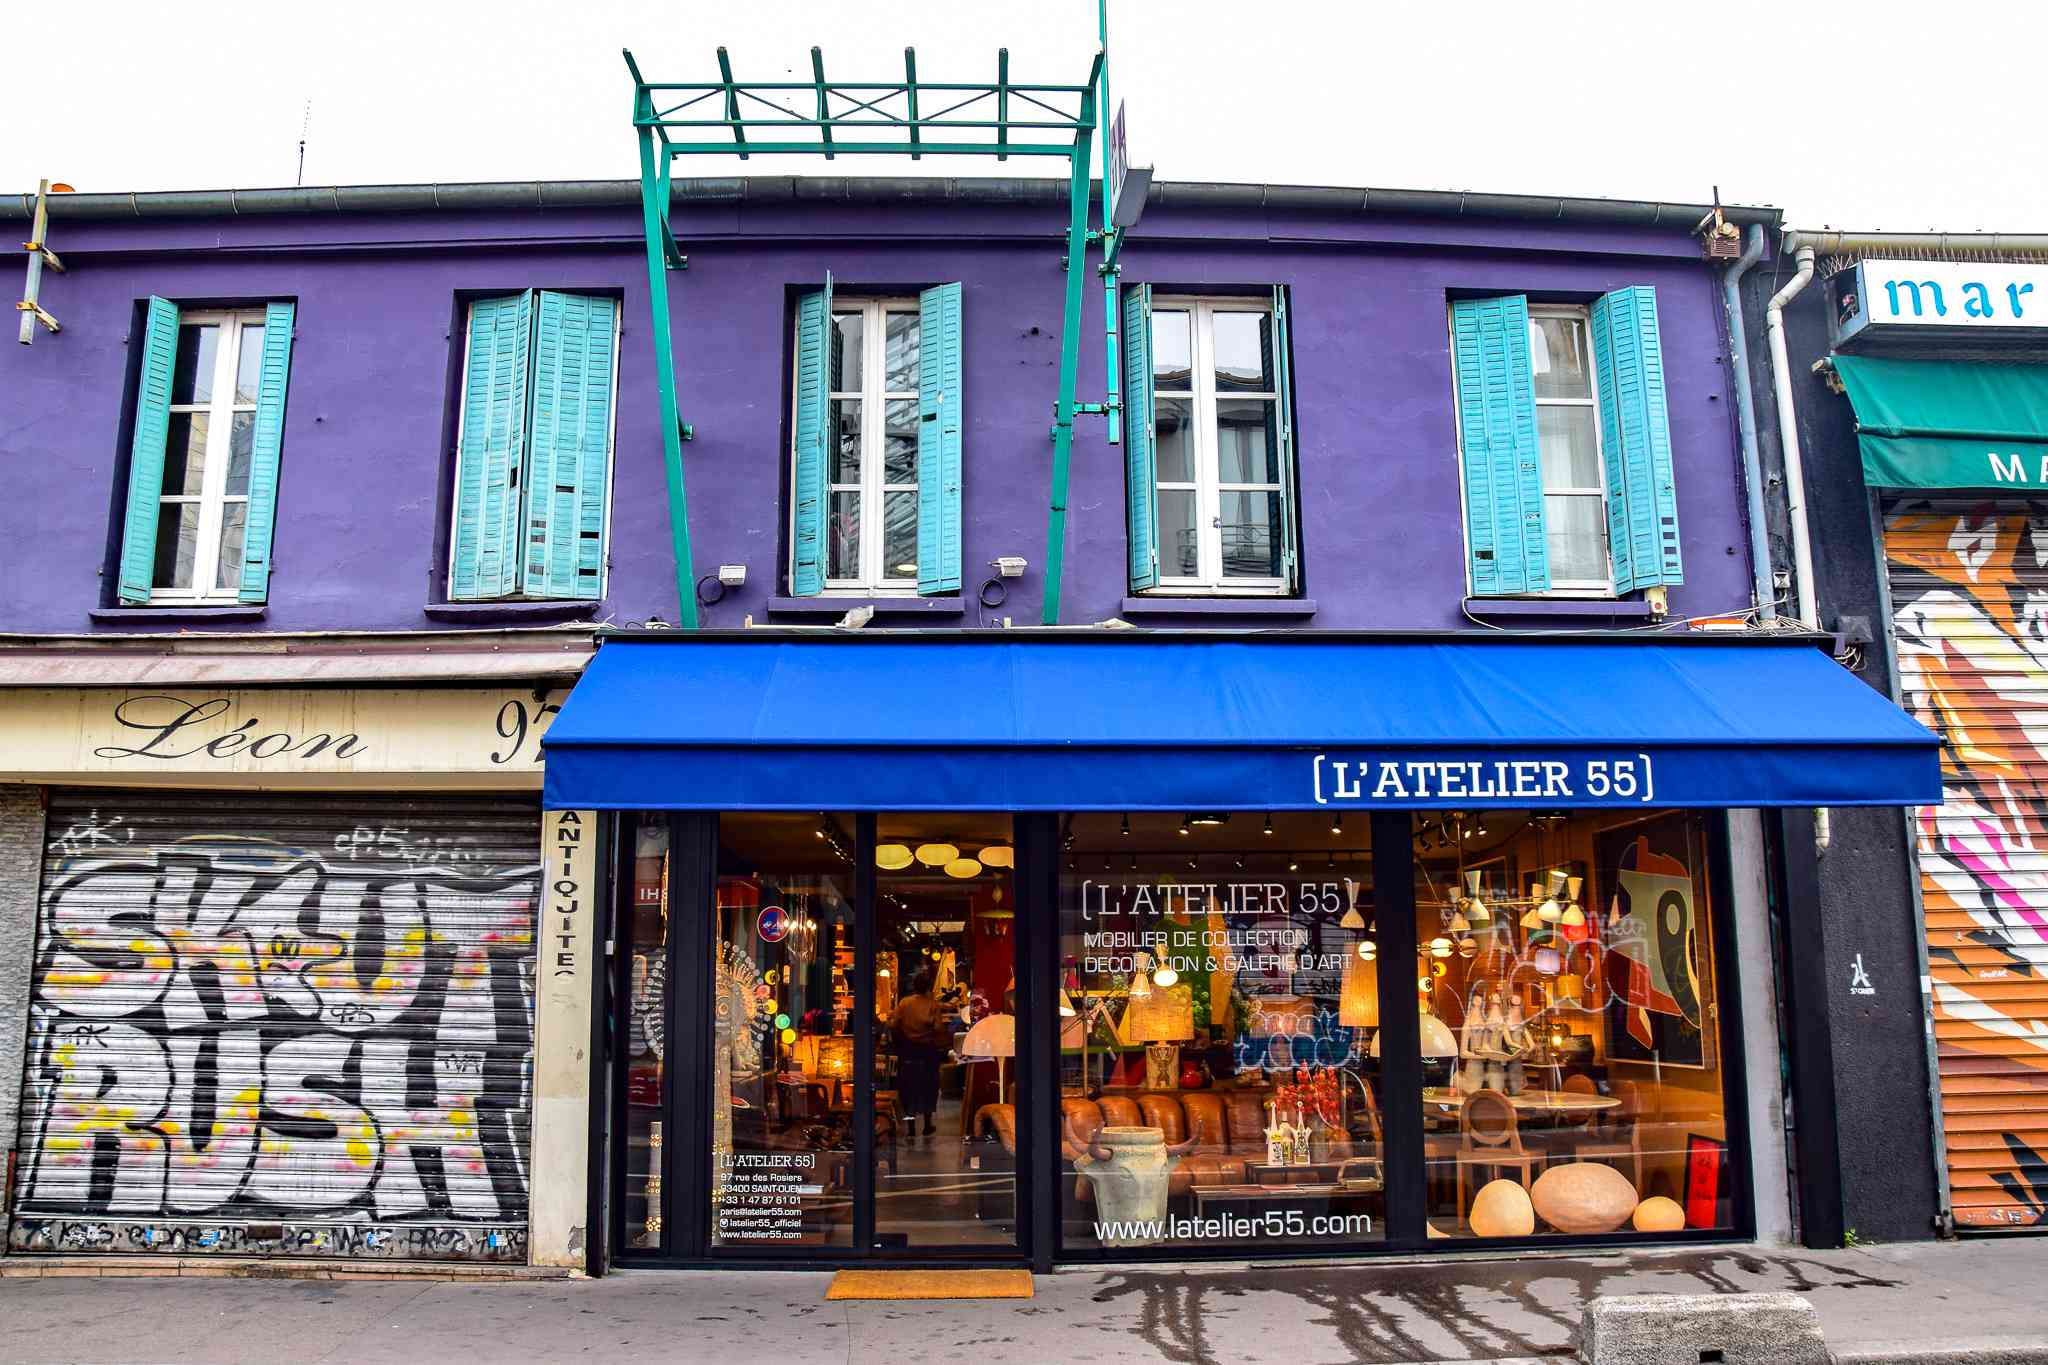 Flea Markets in Paris, France